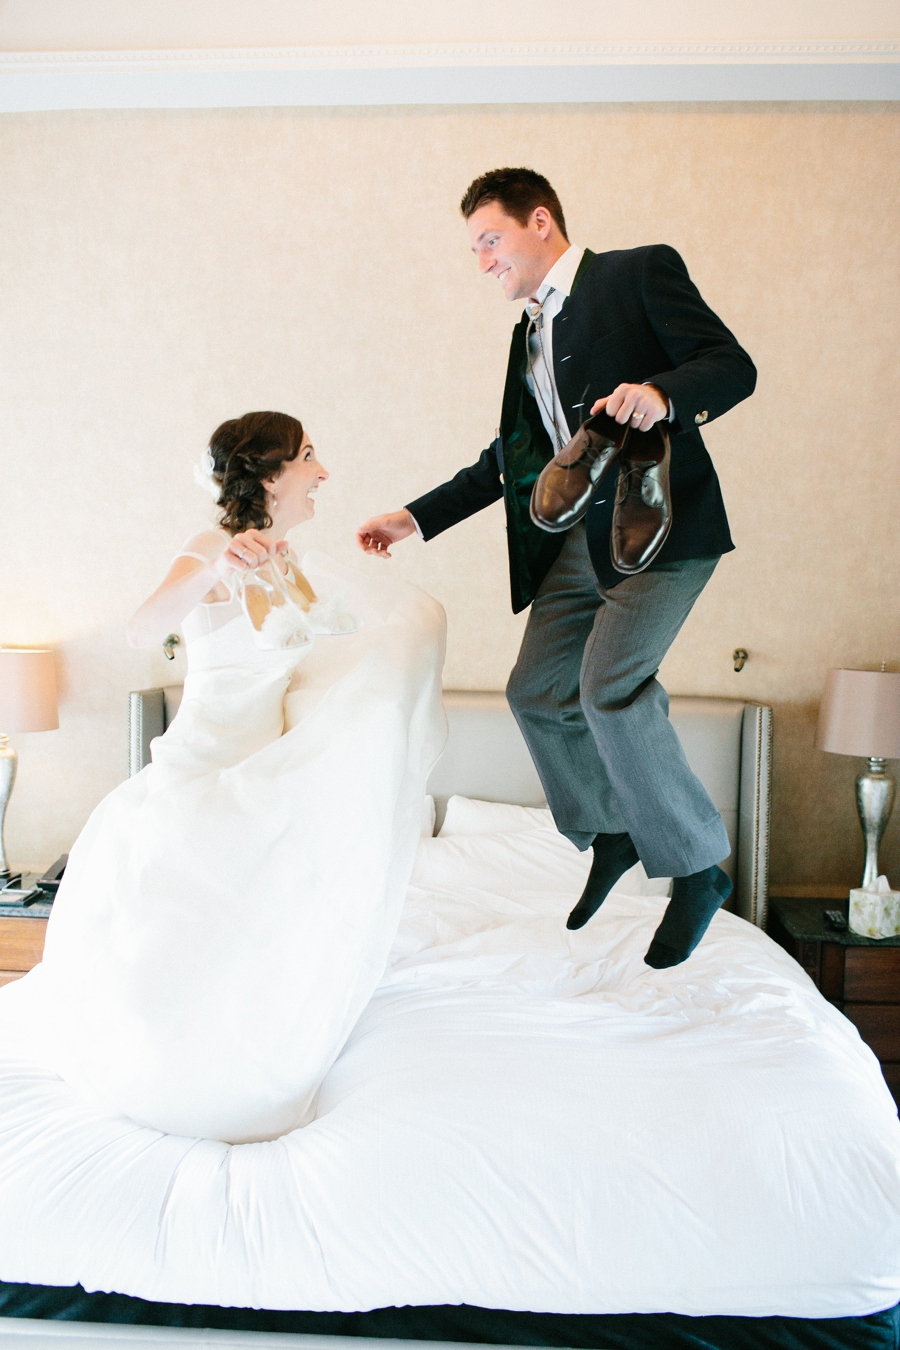 136_The_Fairmont_Banff_Springs_Banff_Alberta_Canada_Wedding_Photo.JPG